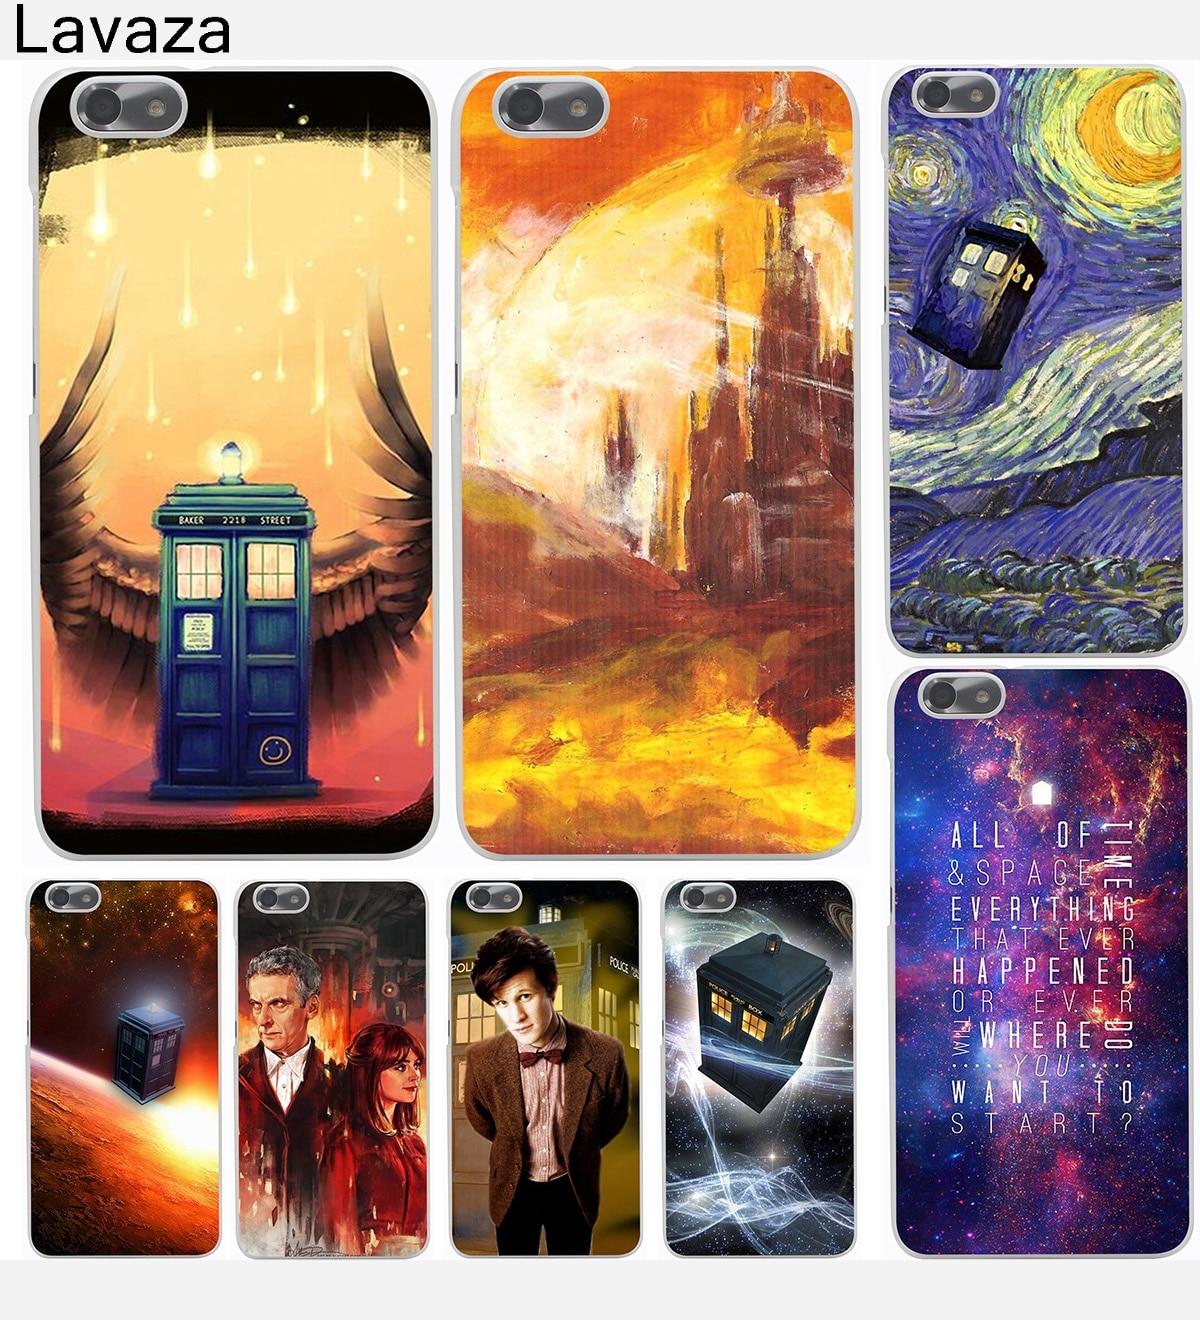 Lavaza Doctor Who Tardis series Pattern Hard Case for Huawei P6 P7 P8 P9 P10 Lite Plus Y3 Y5 Y6 Y7 P8 Lite P9 Lite 2017 G7